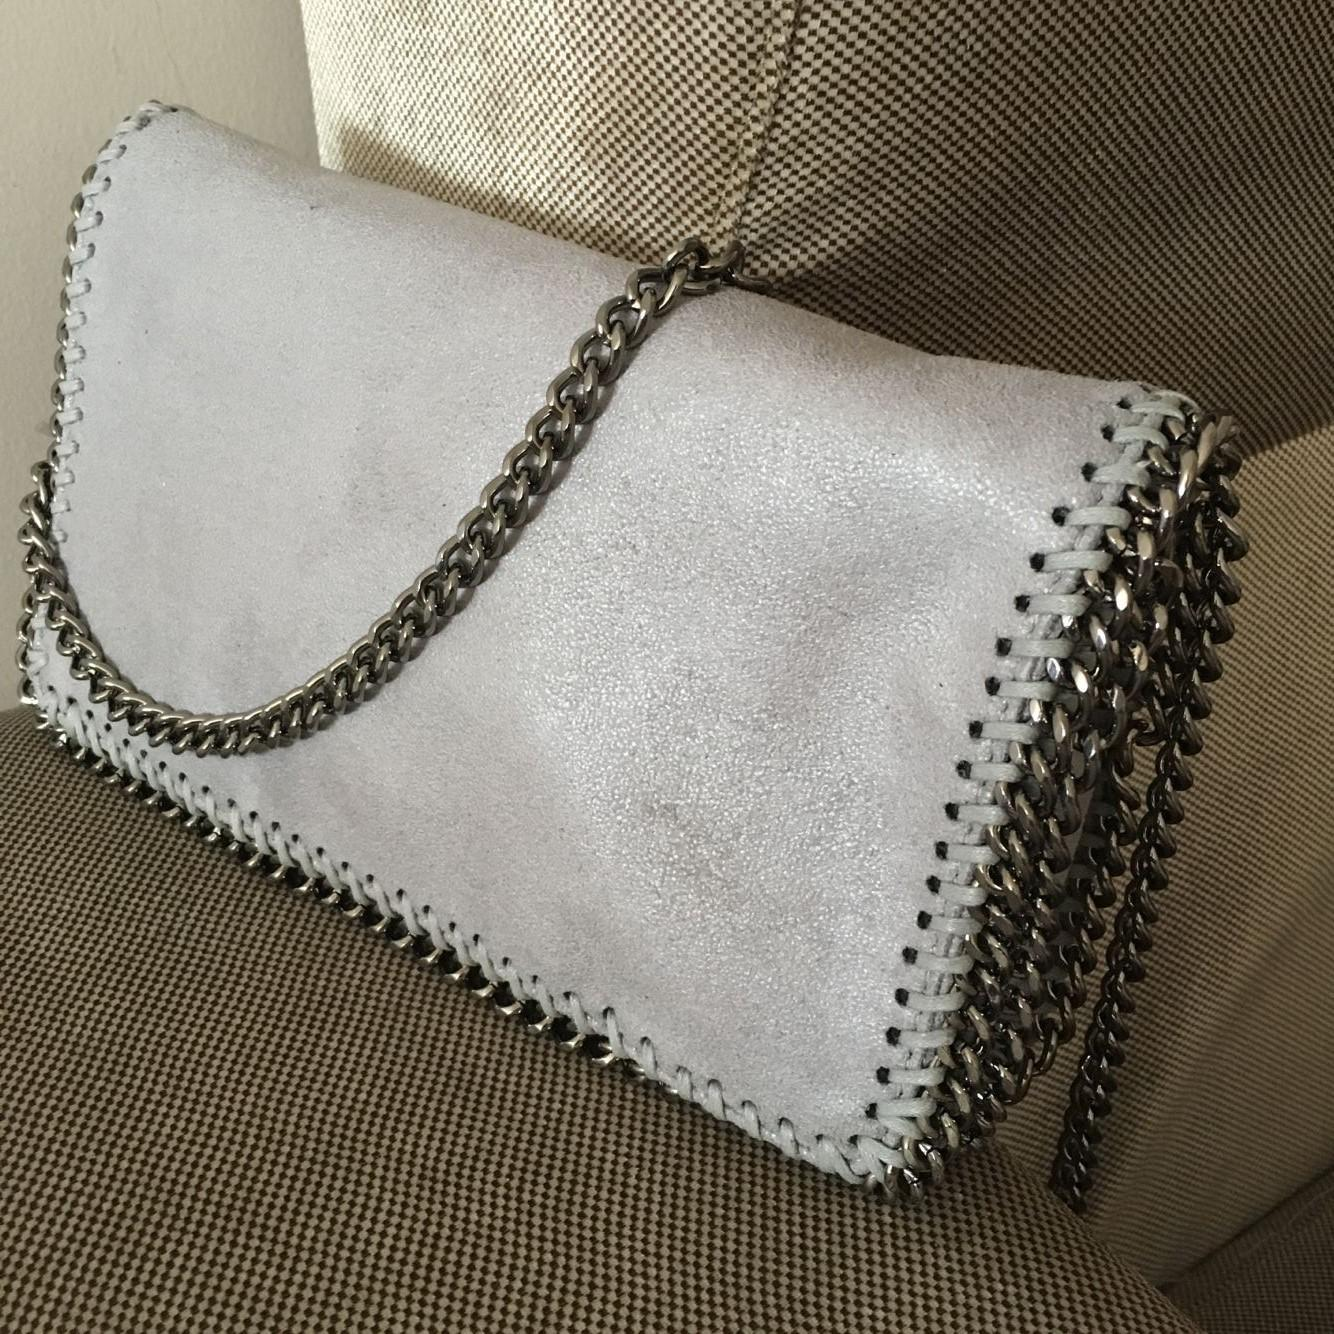 22cm Haspp PVC Shaggy Deer Falabella Flap Pocket Chain Bag Crossbody ... 15c332f5e23fa